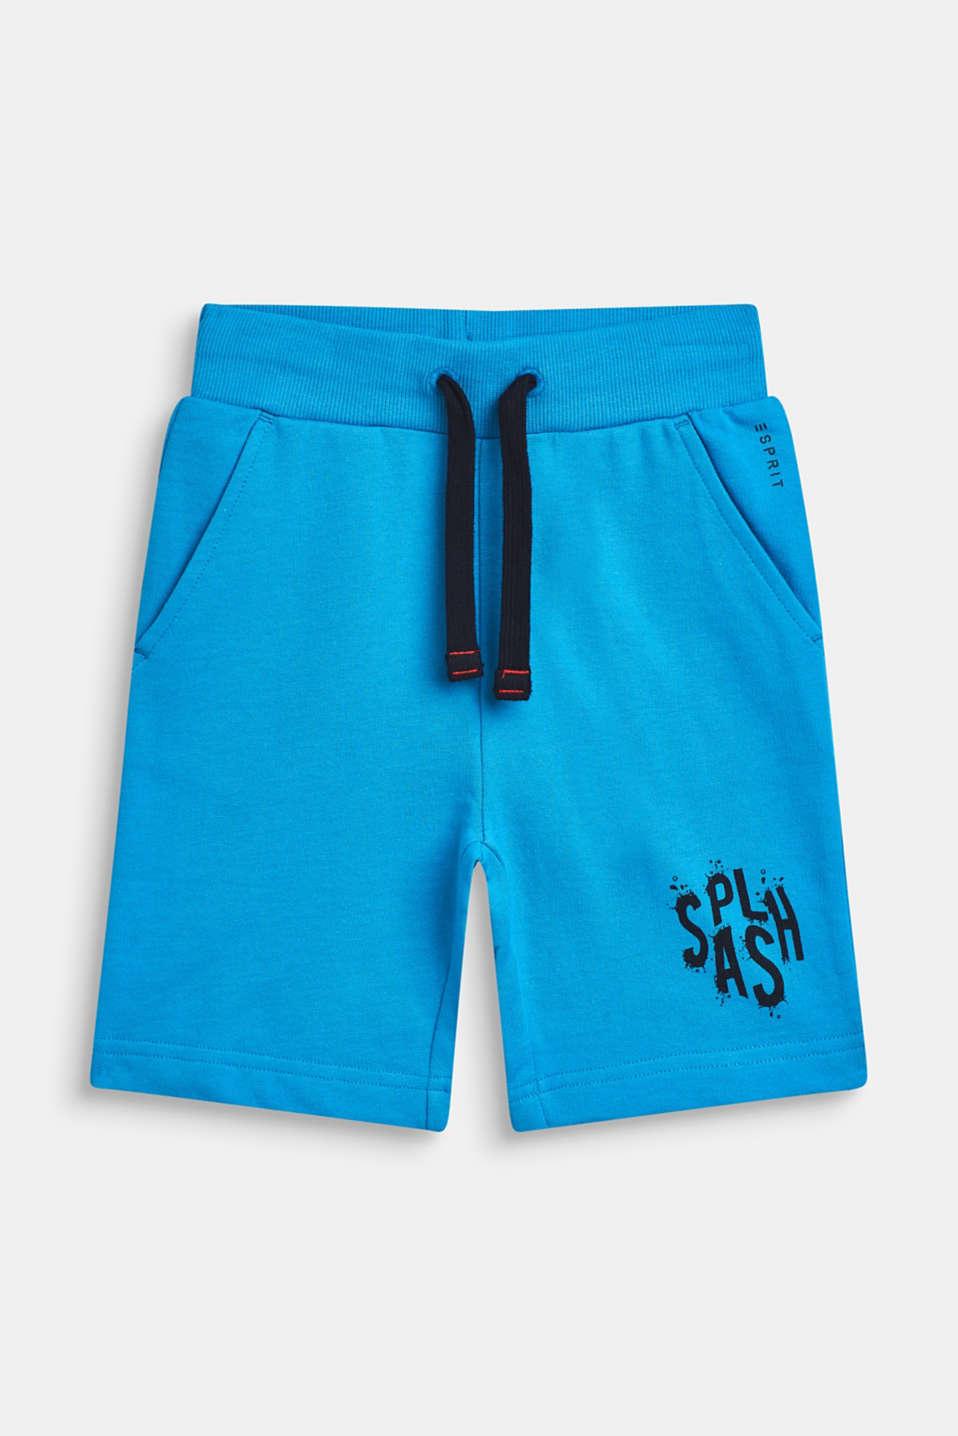 Sweatshirt Bermudas with print, 100% cotton, BRIGHT BLUE, detail image number 0